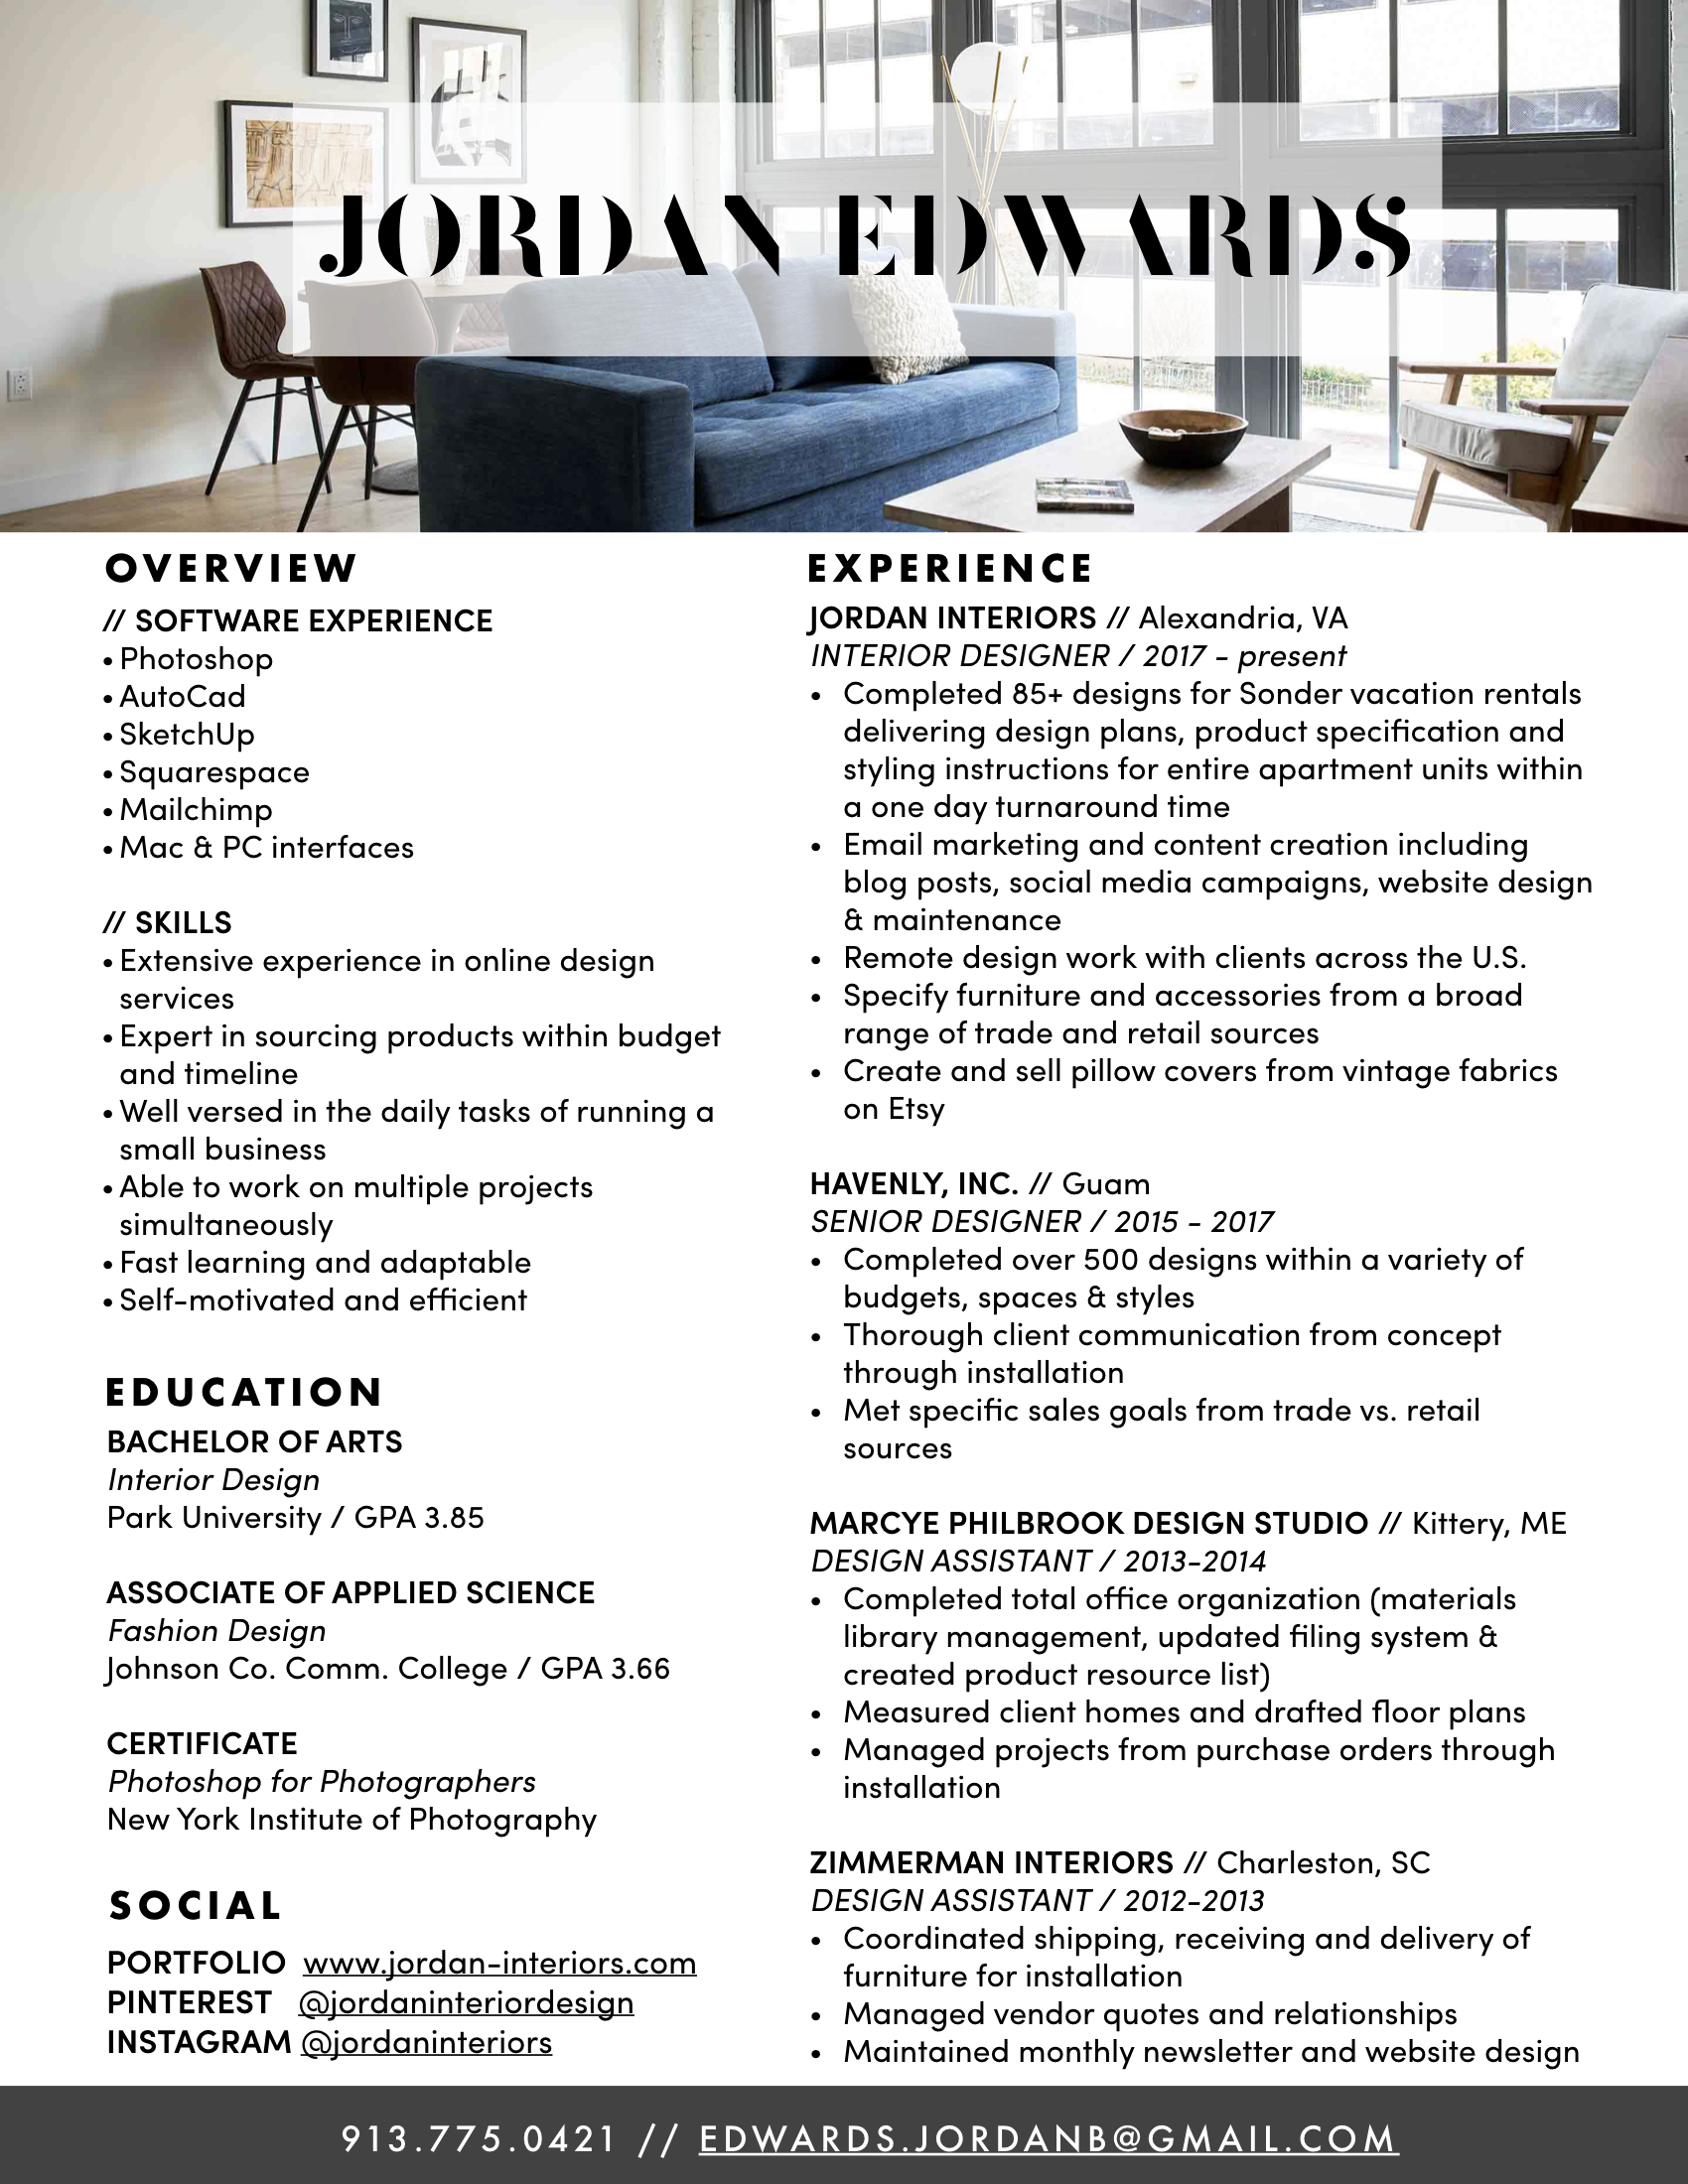 Resume-jpg.001.jpeg